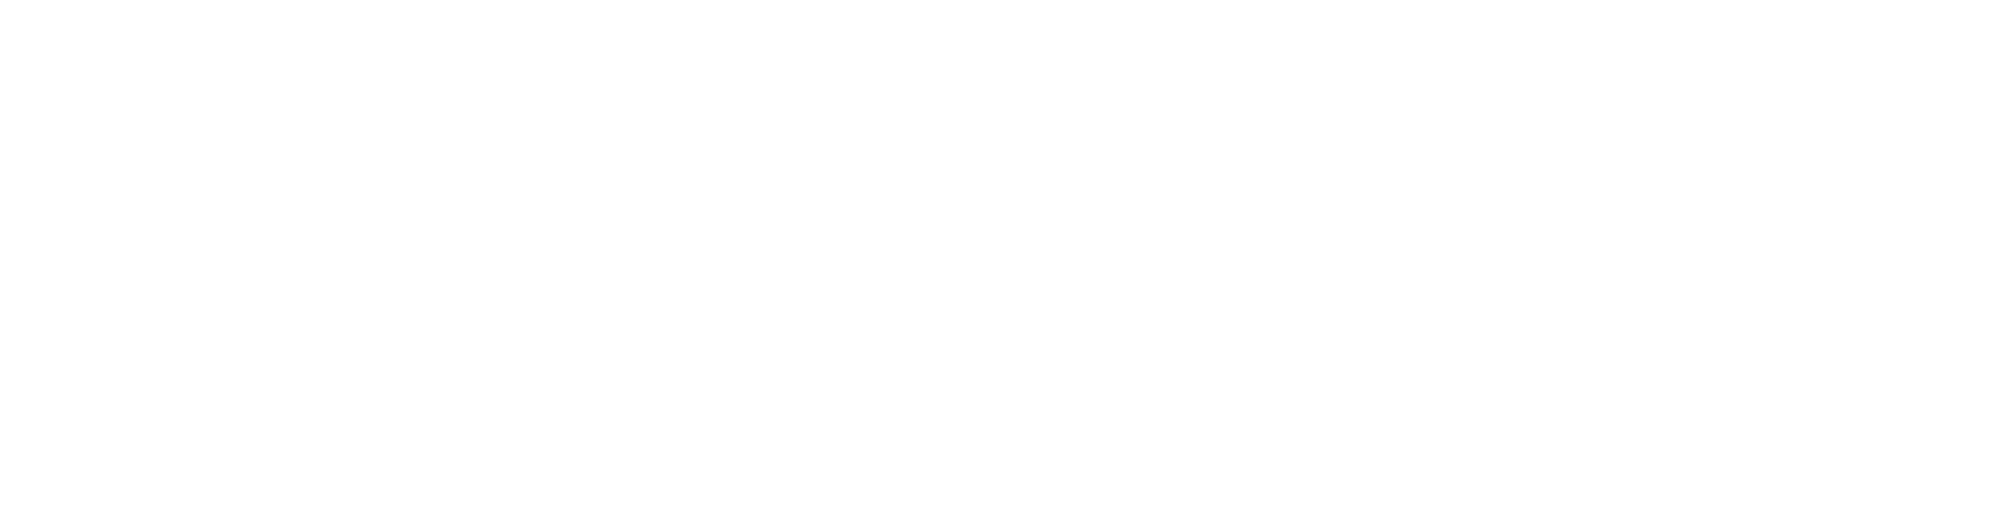 Aawander Permakultur